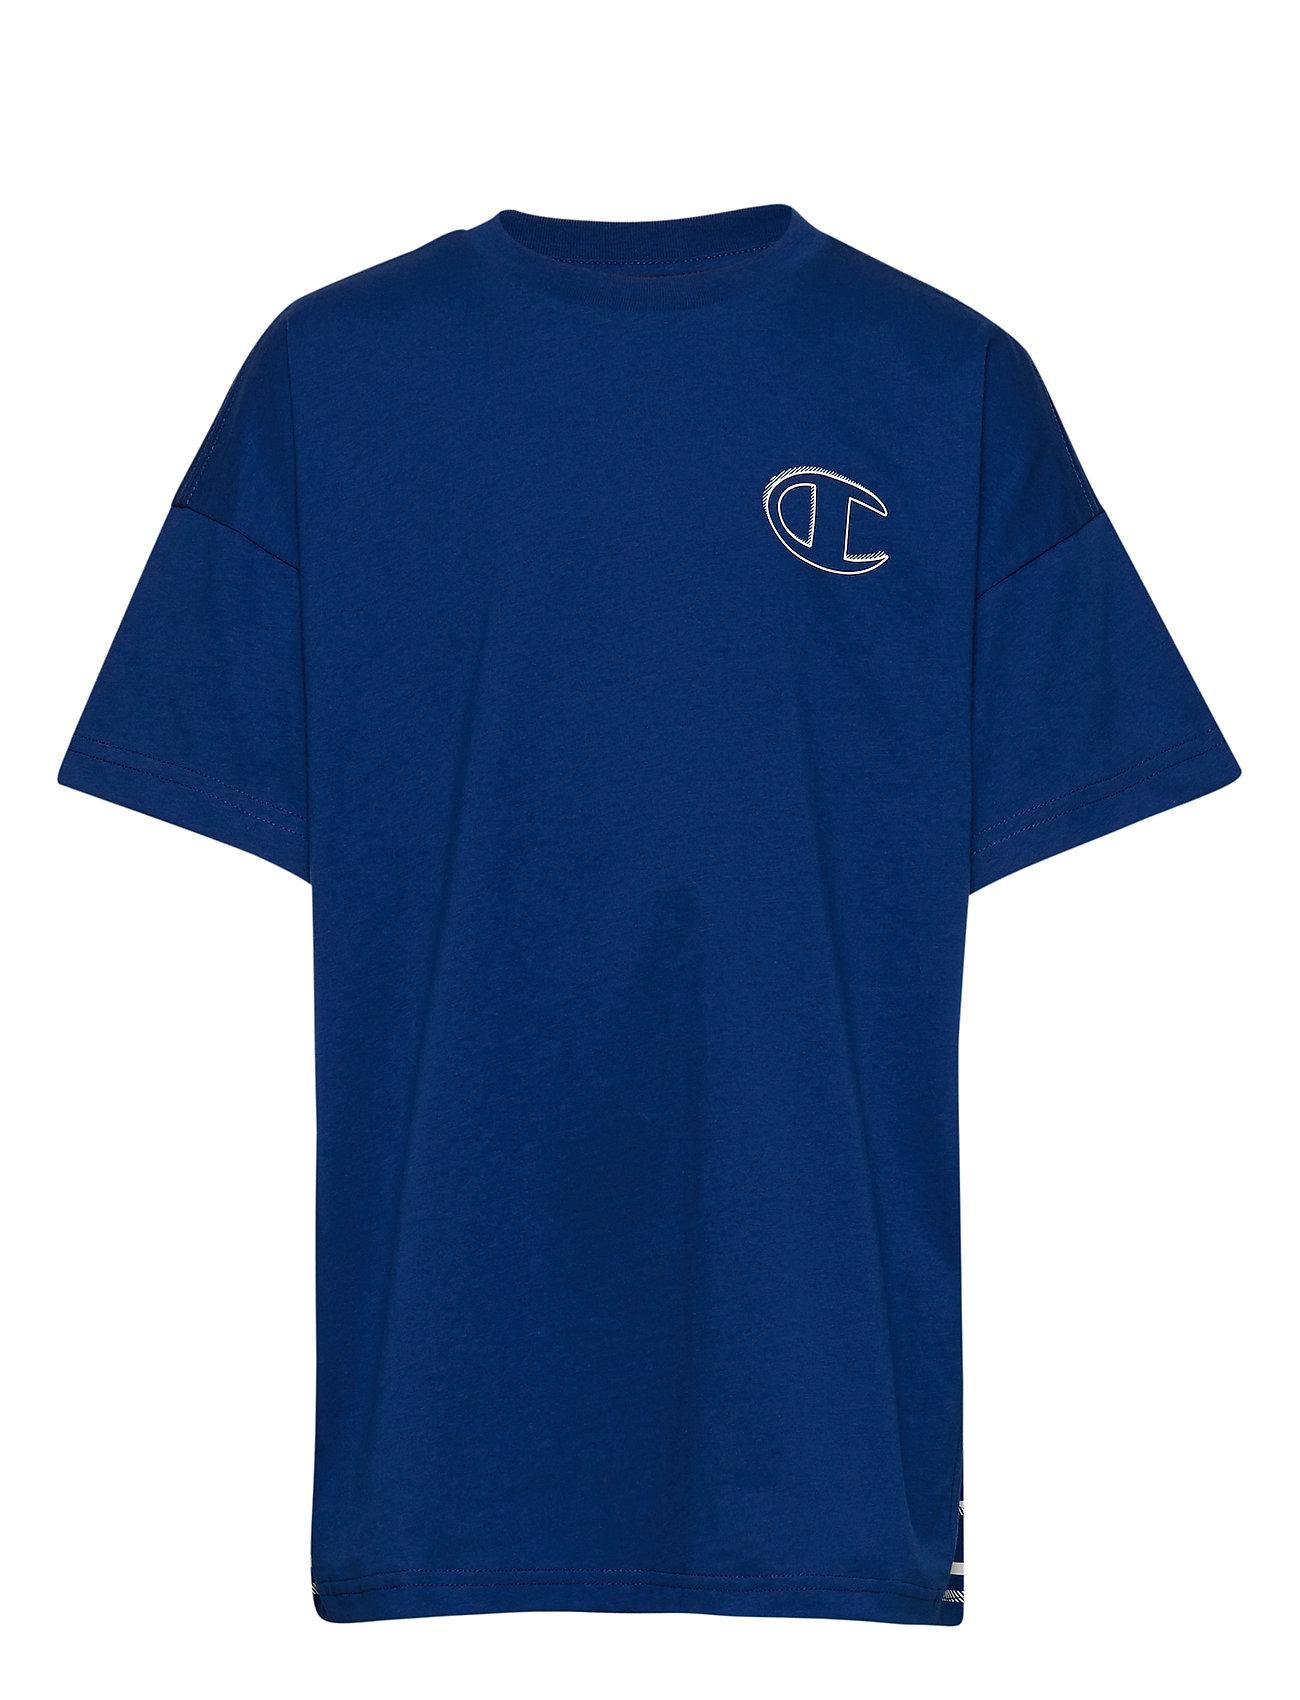 Champion Crewneck T-Shirt - SODALITE BLUE